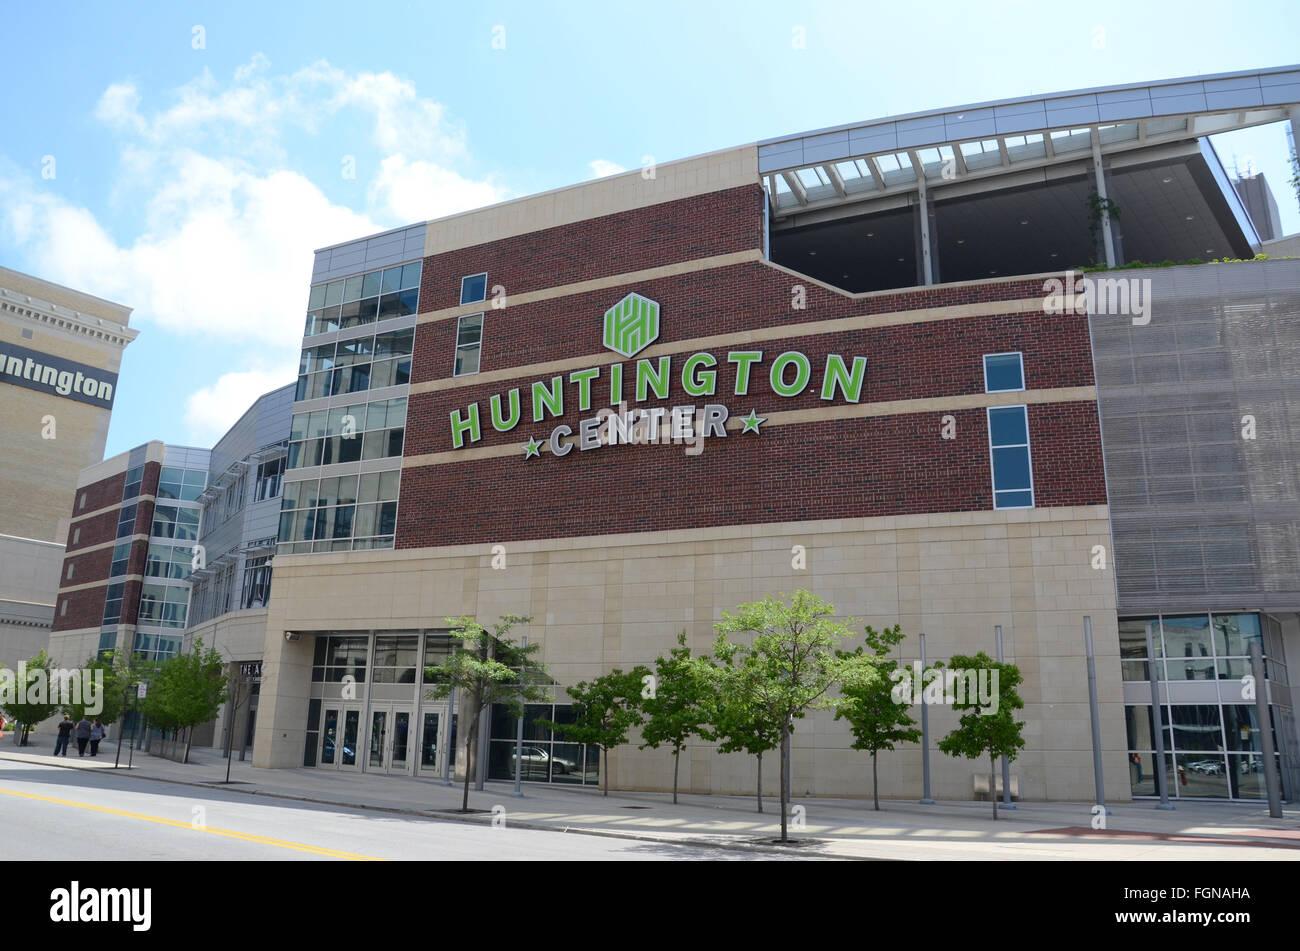 TOLEDO, OH - JUNE 2:  Toledo's Huntington Center, shown on June 2, 2015, is the home of the Toledo Walleye ECHL - Stock Image